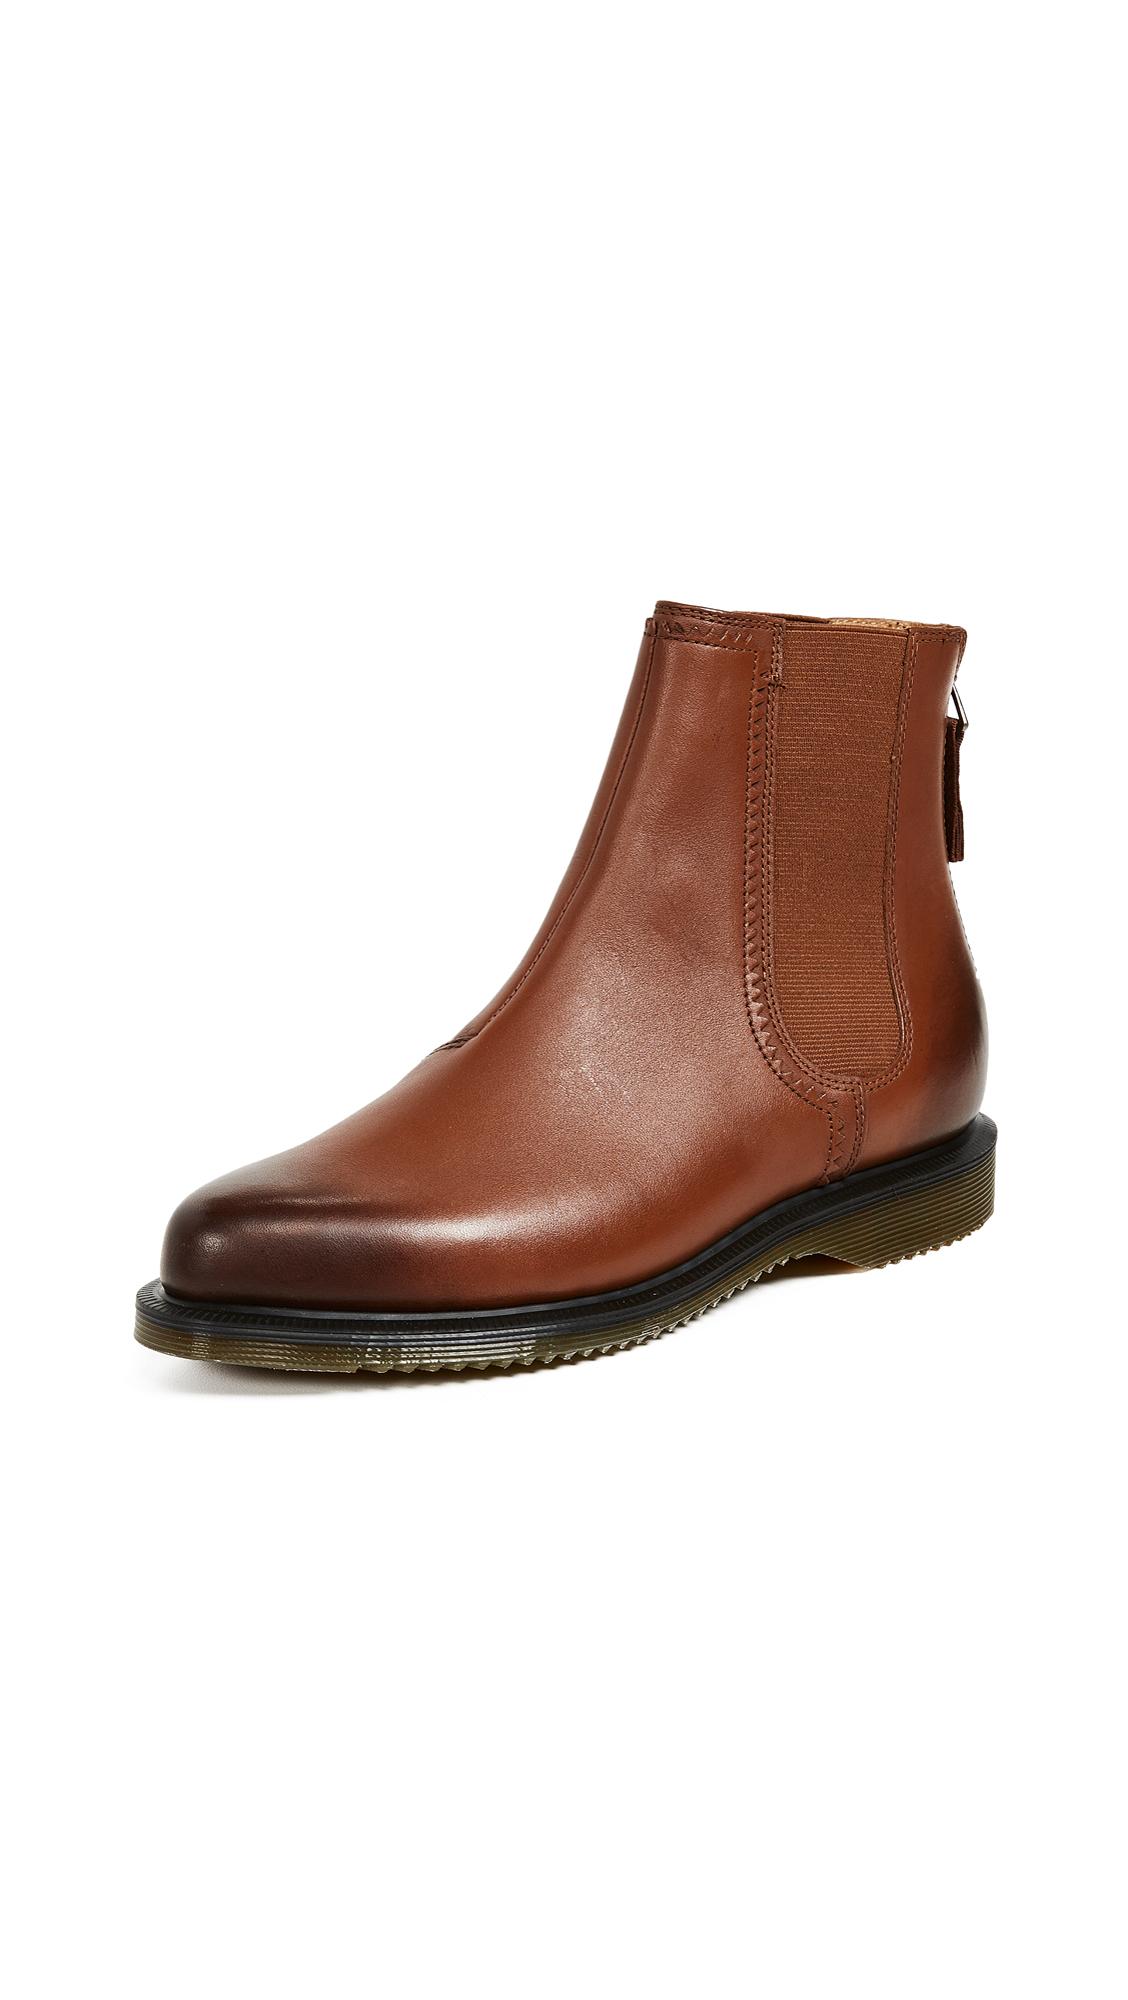 Dr. Martens Zillow Temperley Chelsea Boots